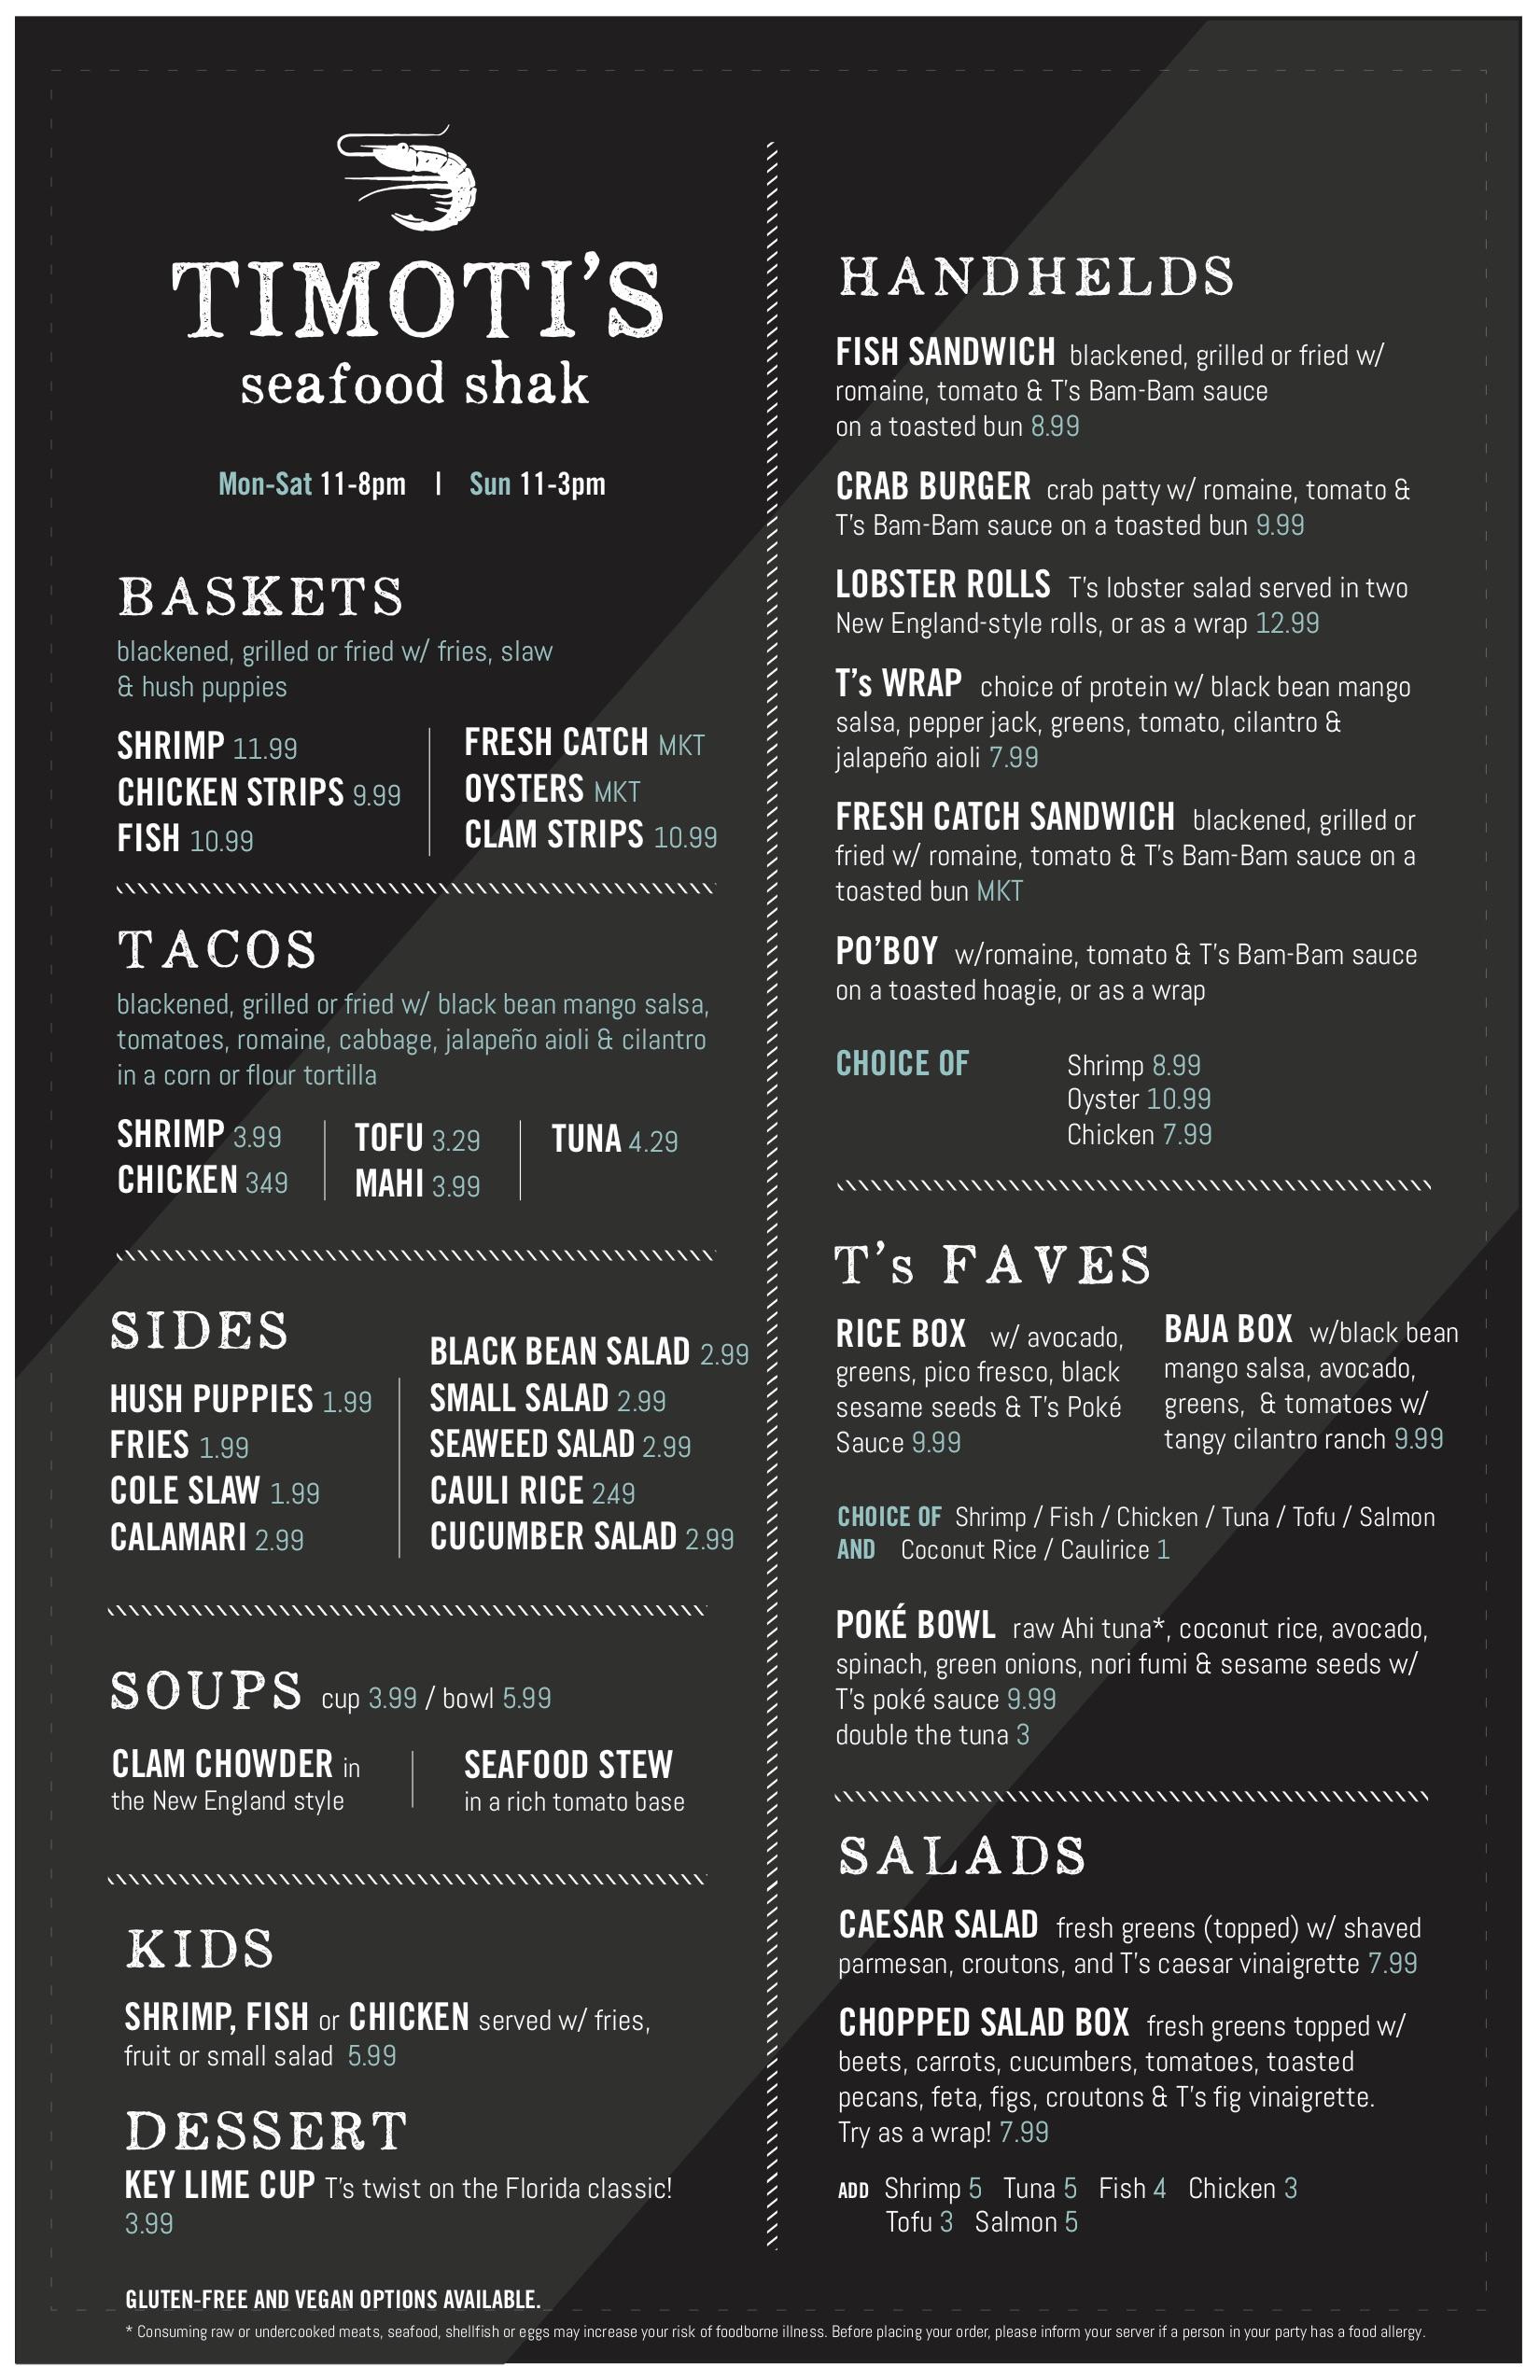 timotis new menu